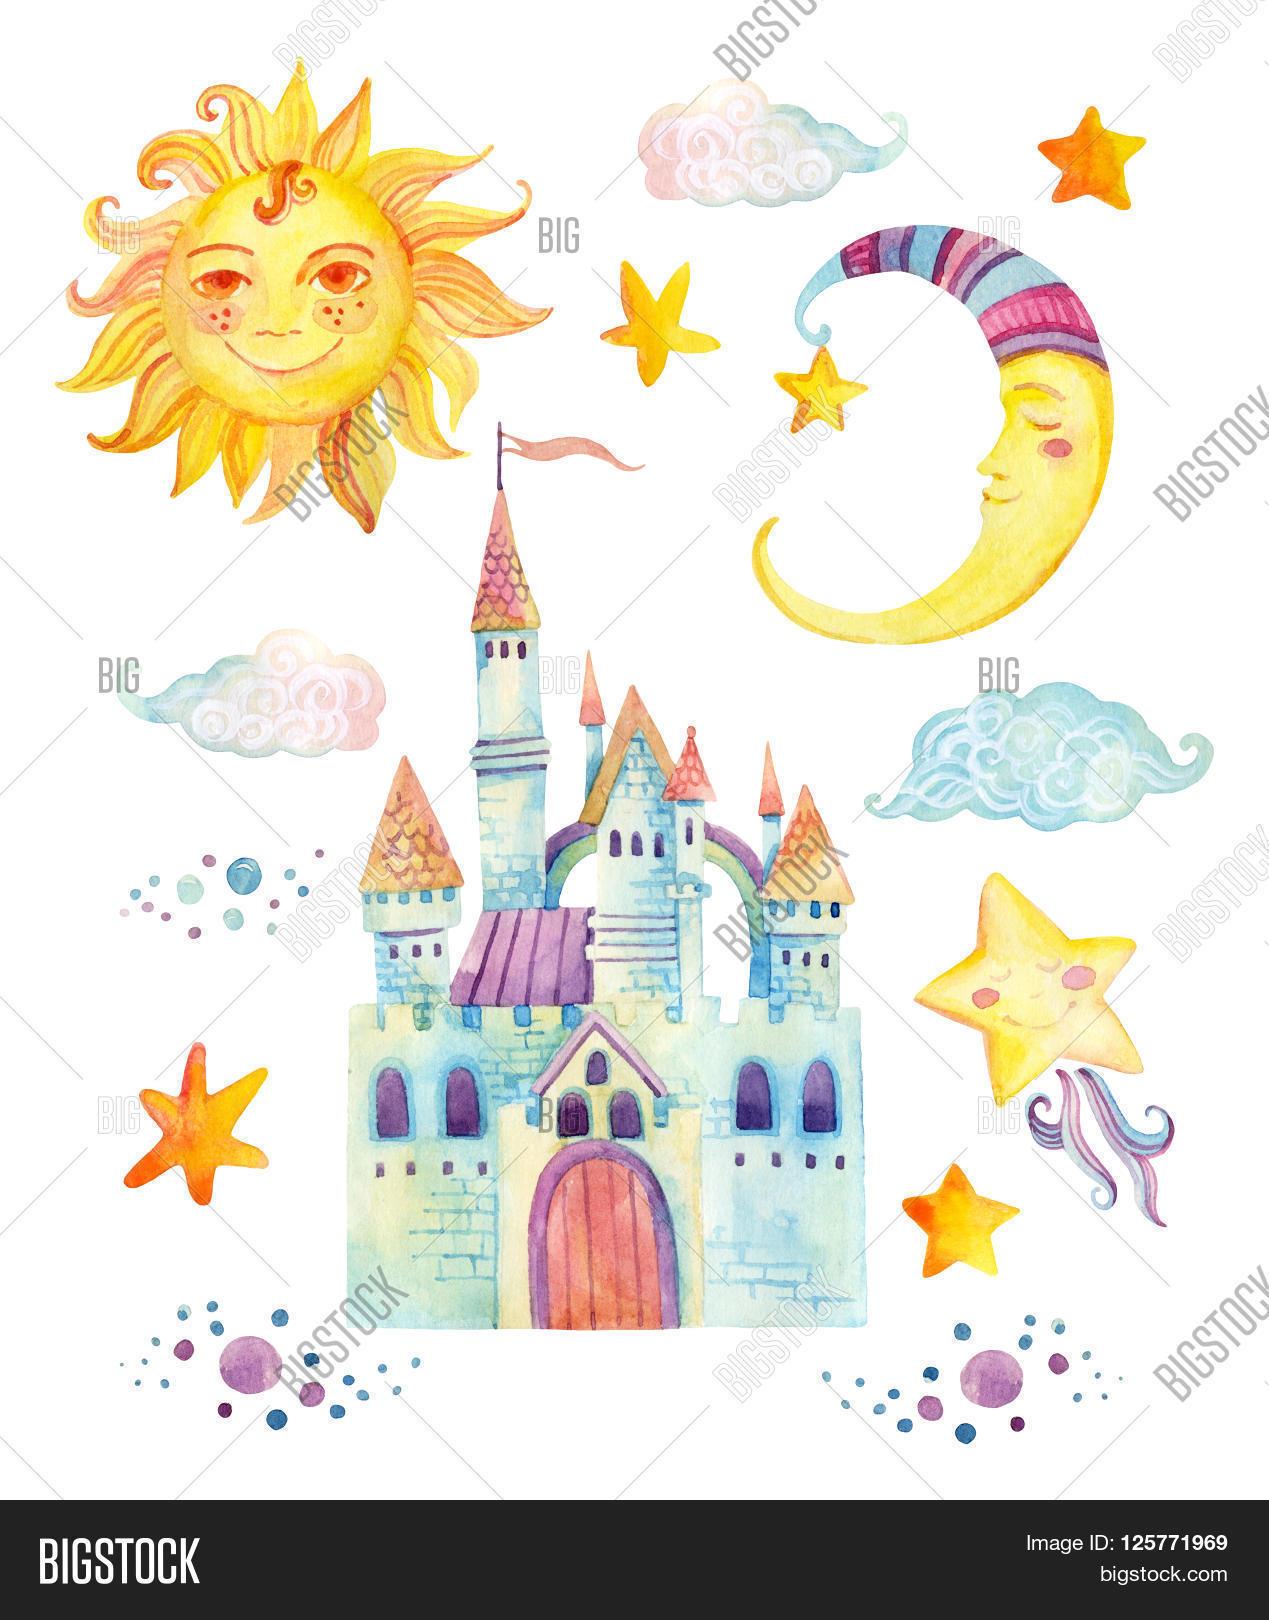 Watercolor Fairy Tale Image Photo Free Trial Bigstock